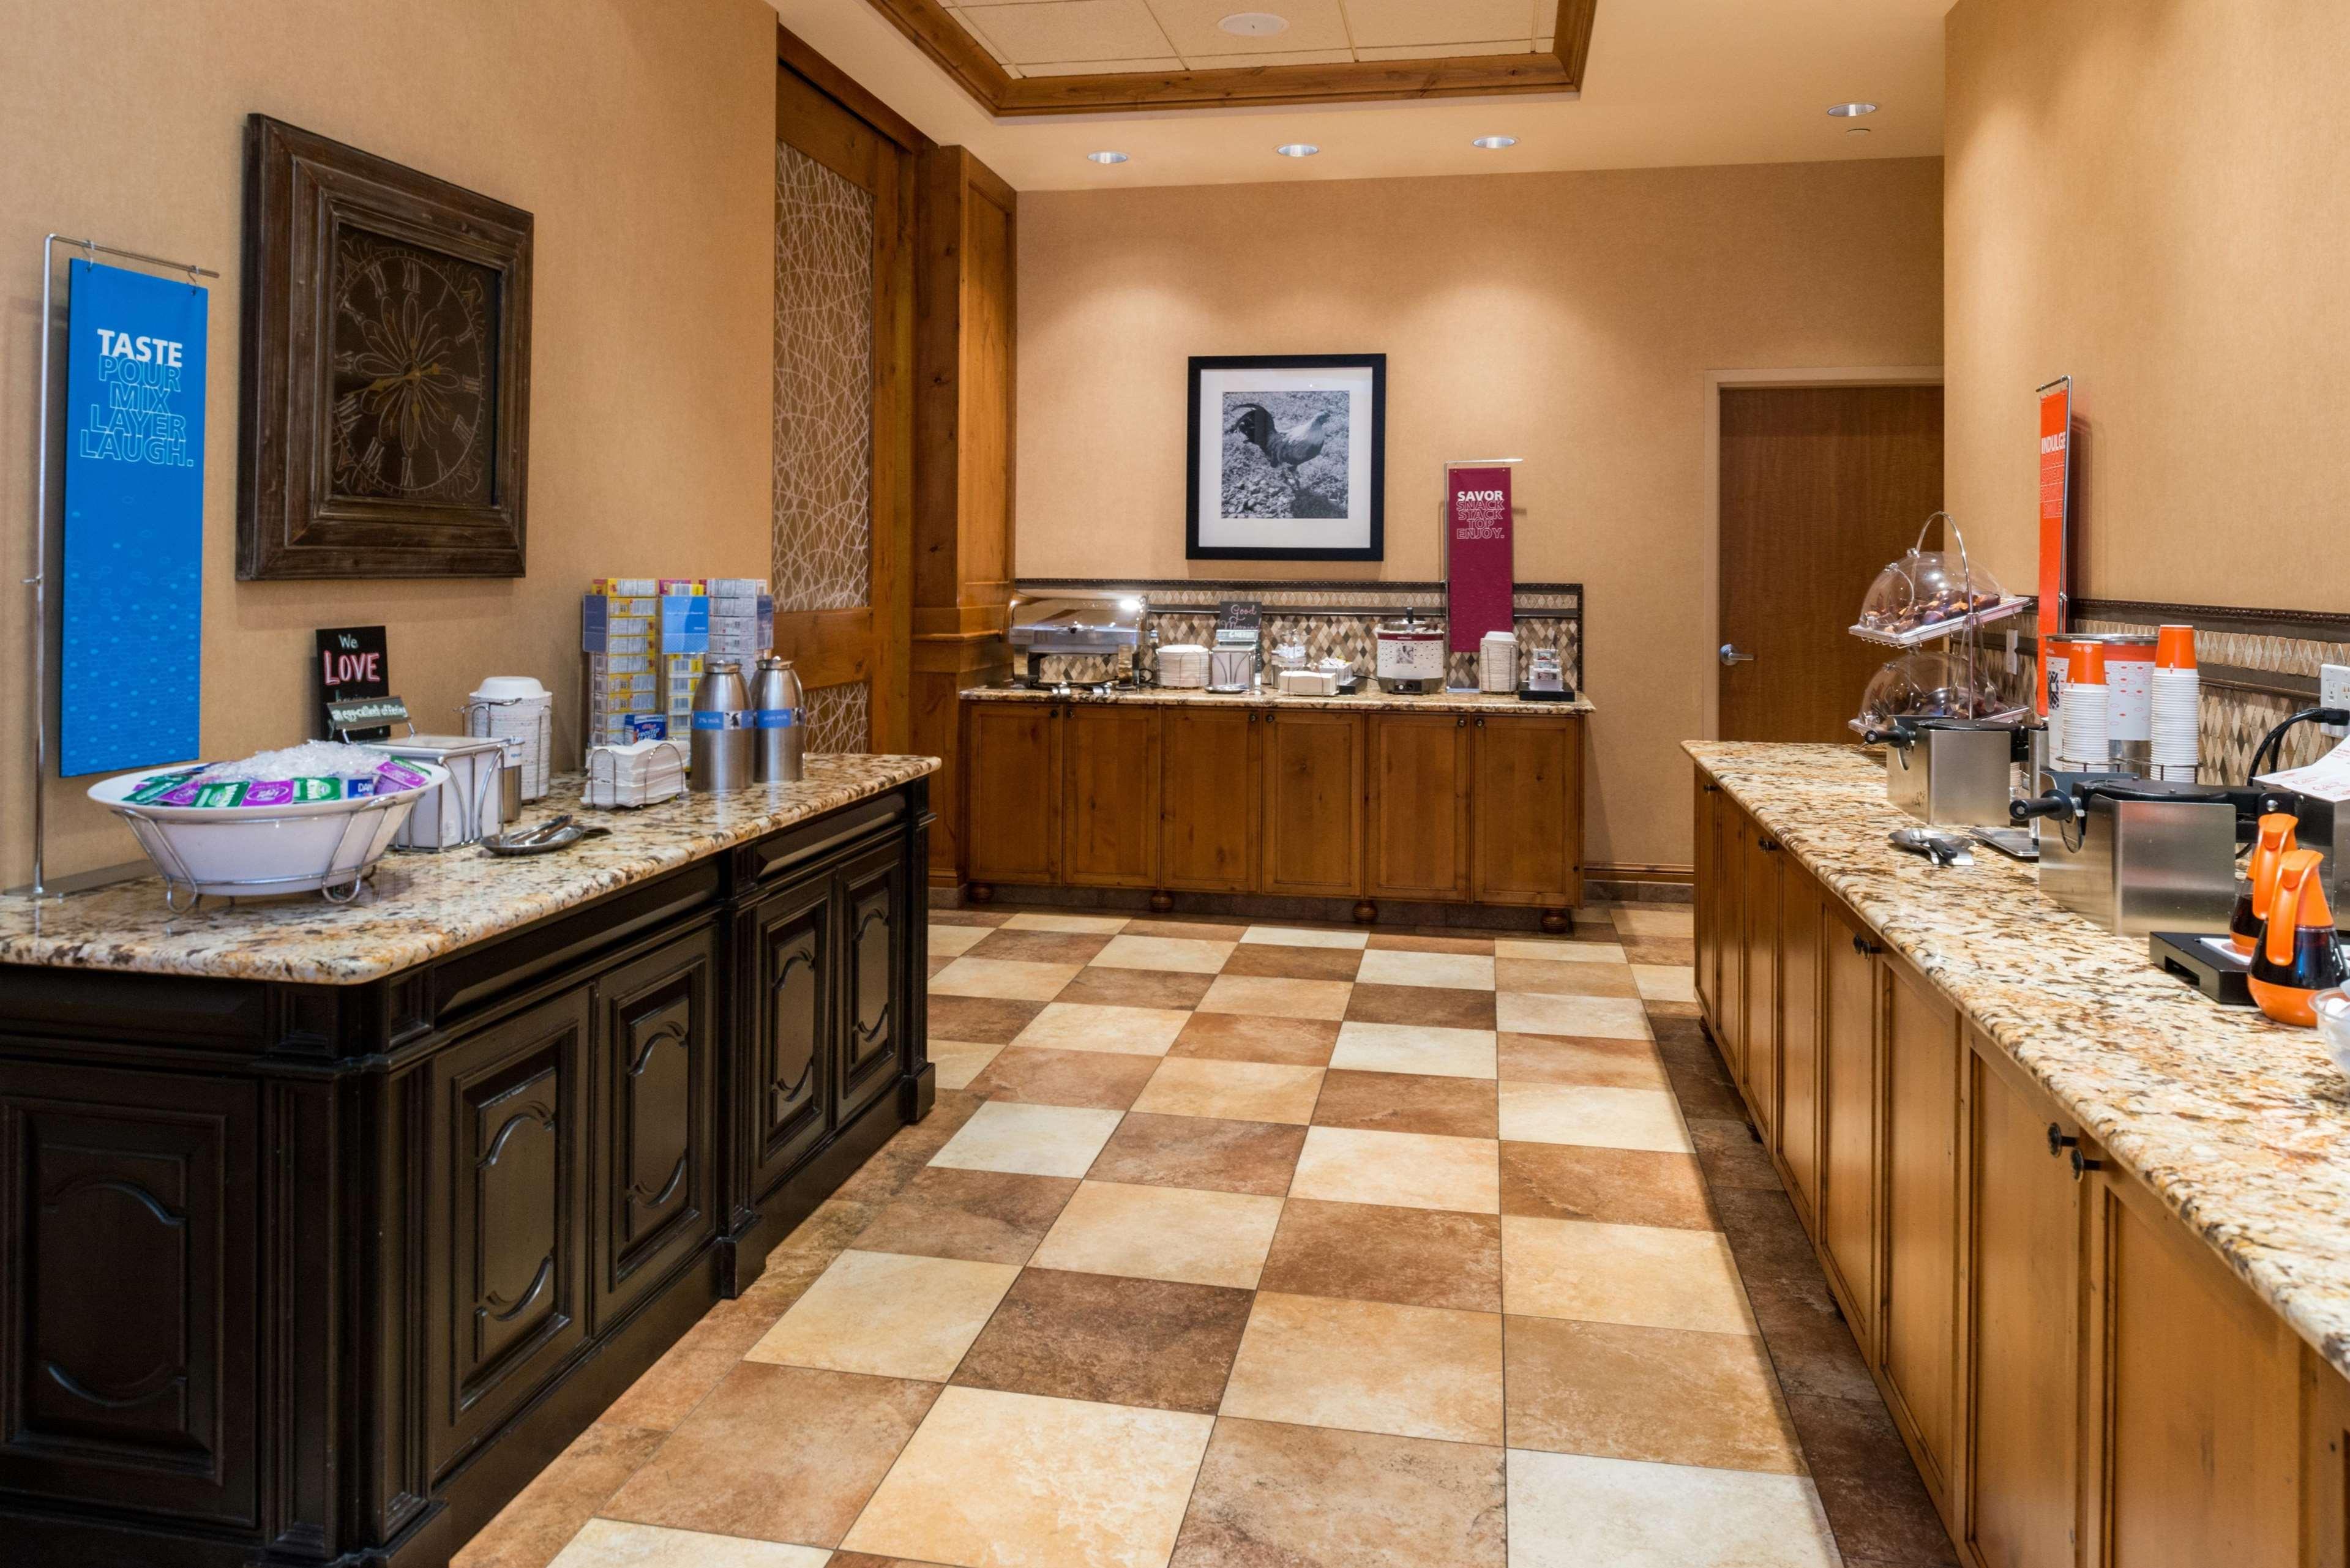 Hampton Inn & Suites Salt Lake City-West Jordan image 32